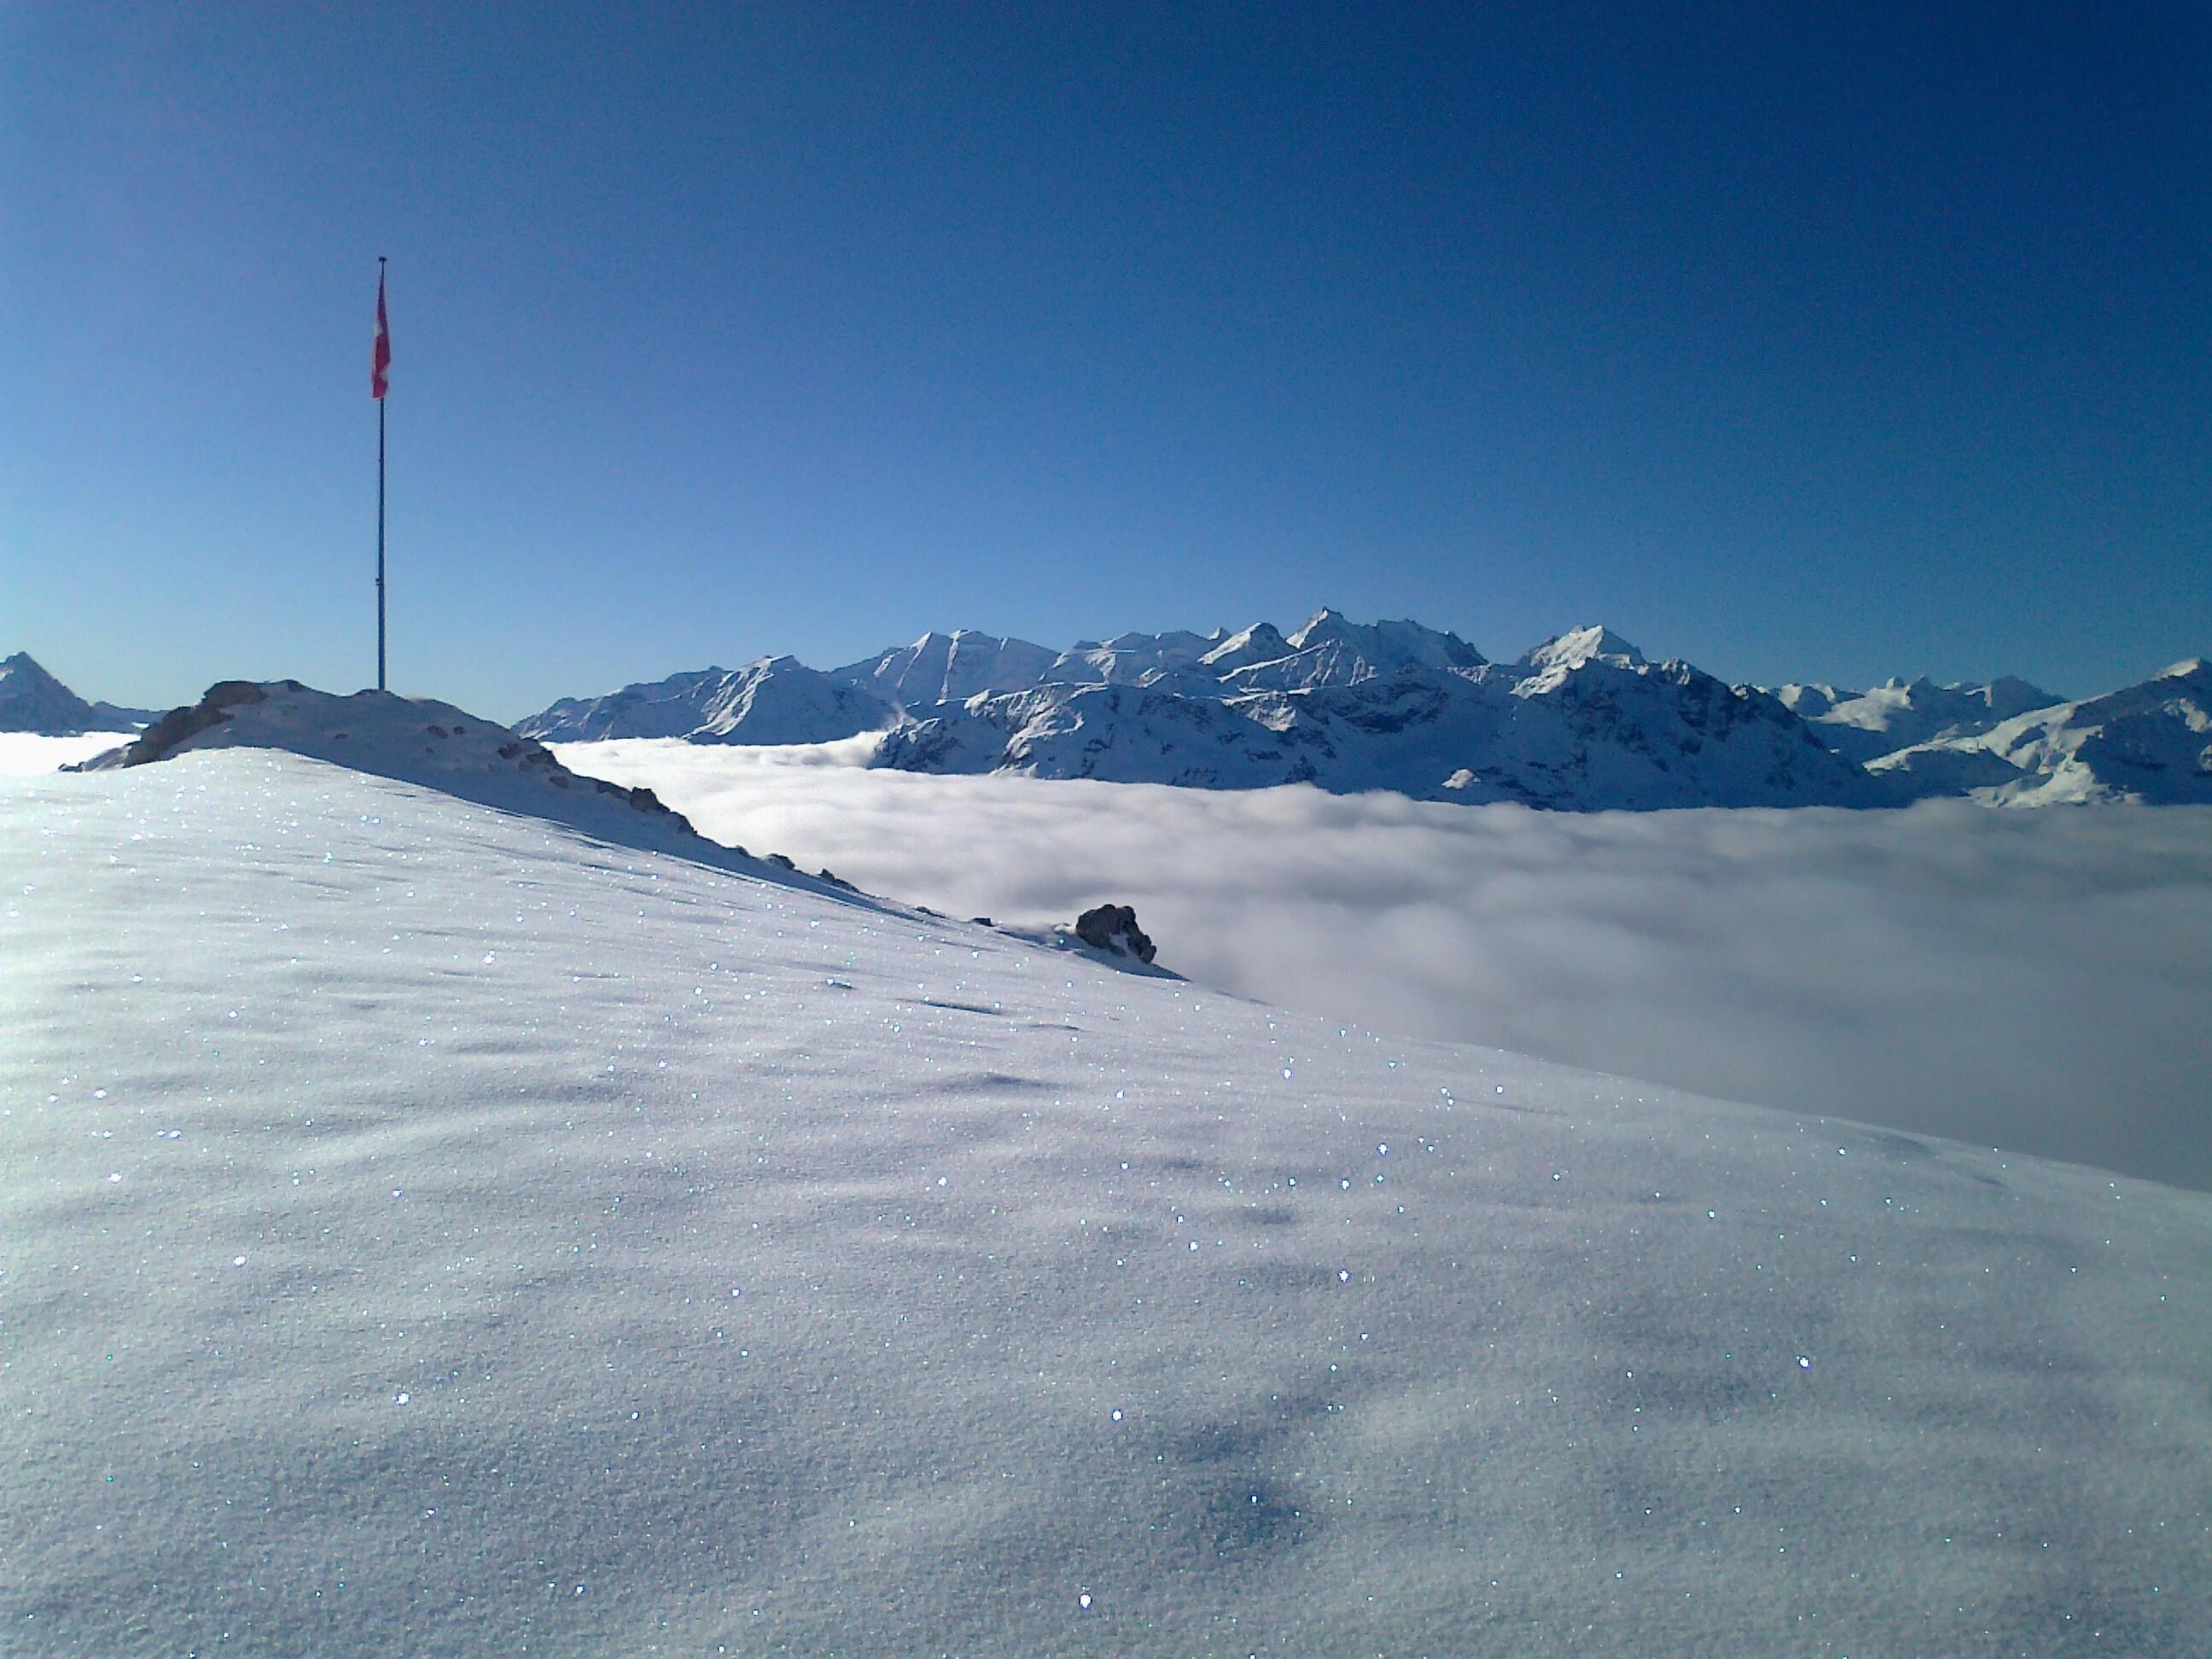 Langlaufschule Bär Snowsports Engadin Slide 2